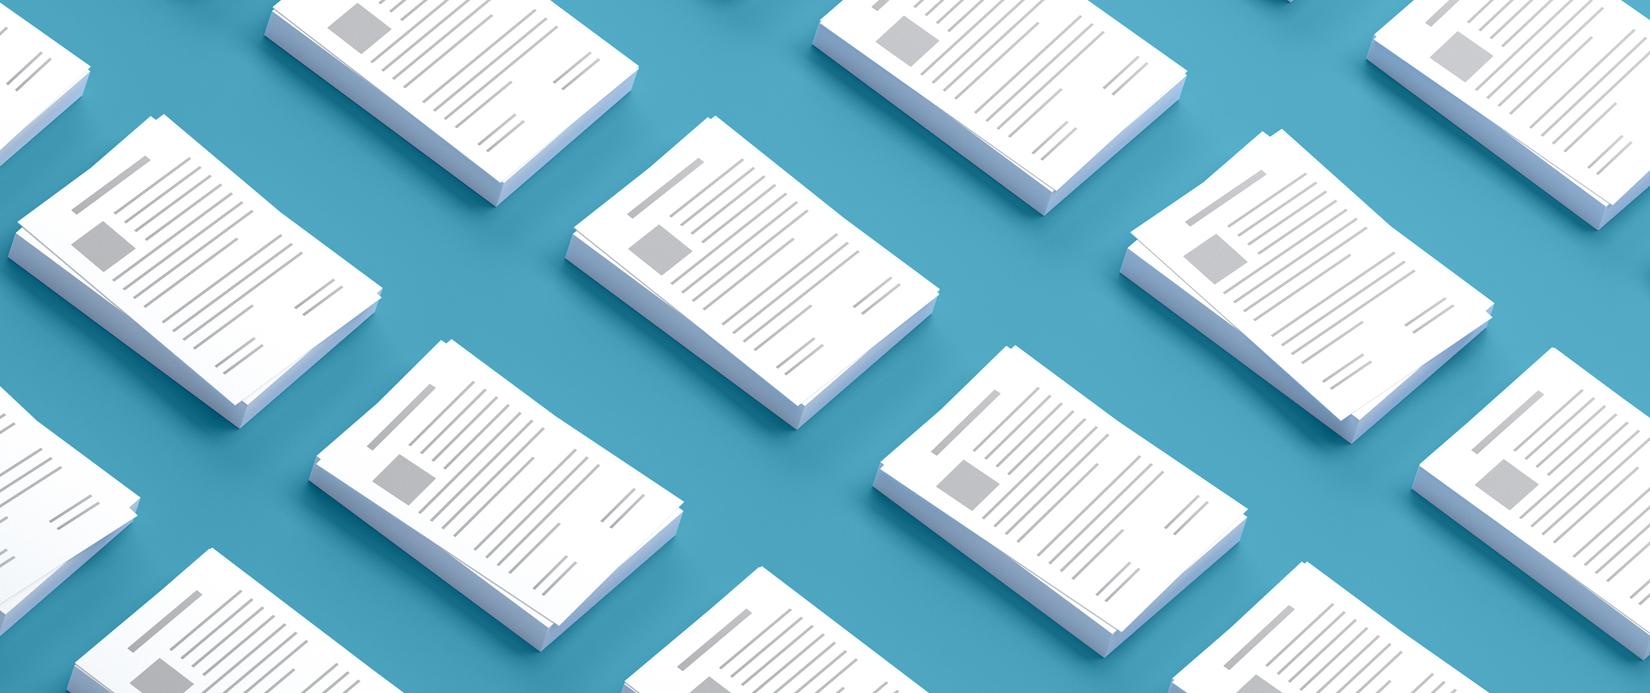 Pramata-blog-legal-tech.jpg